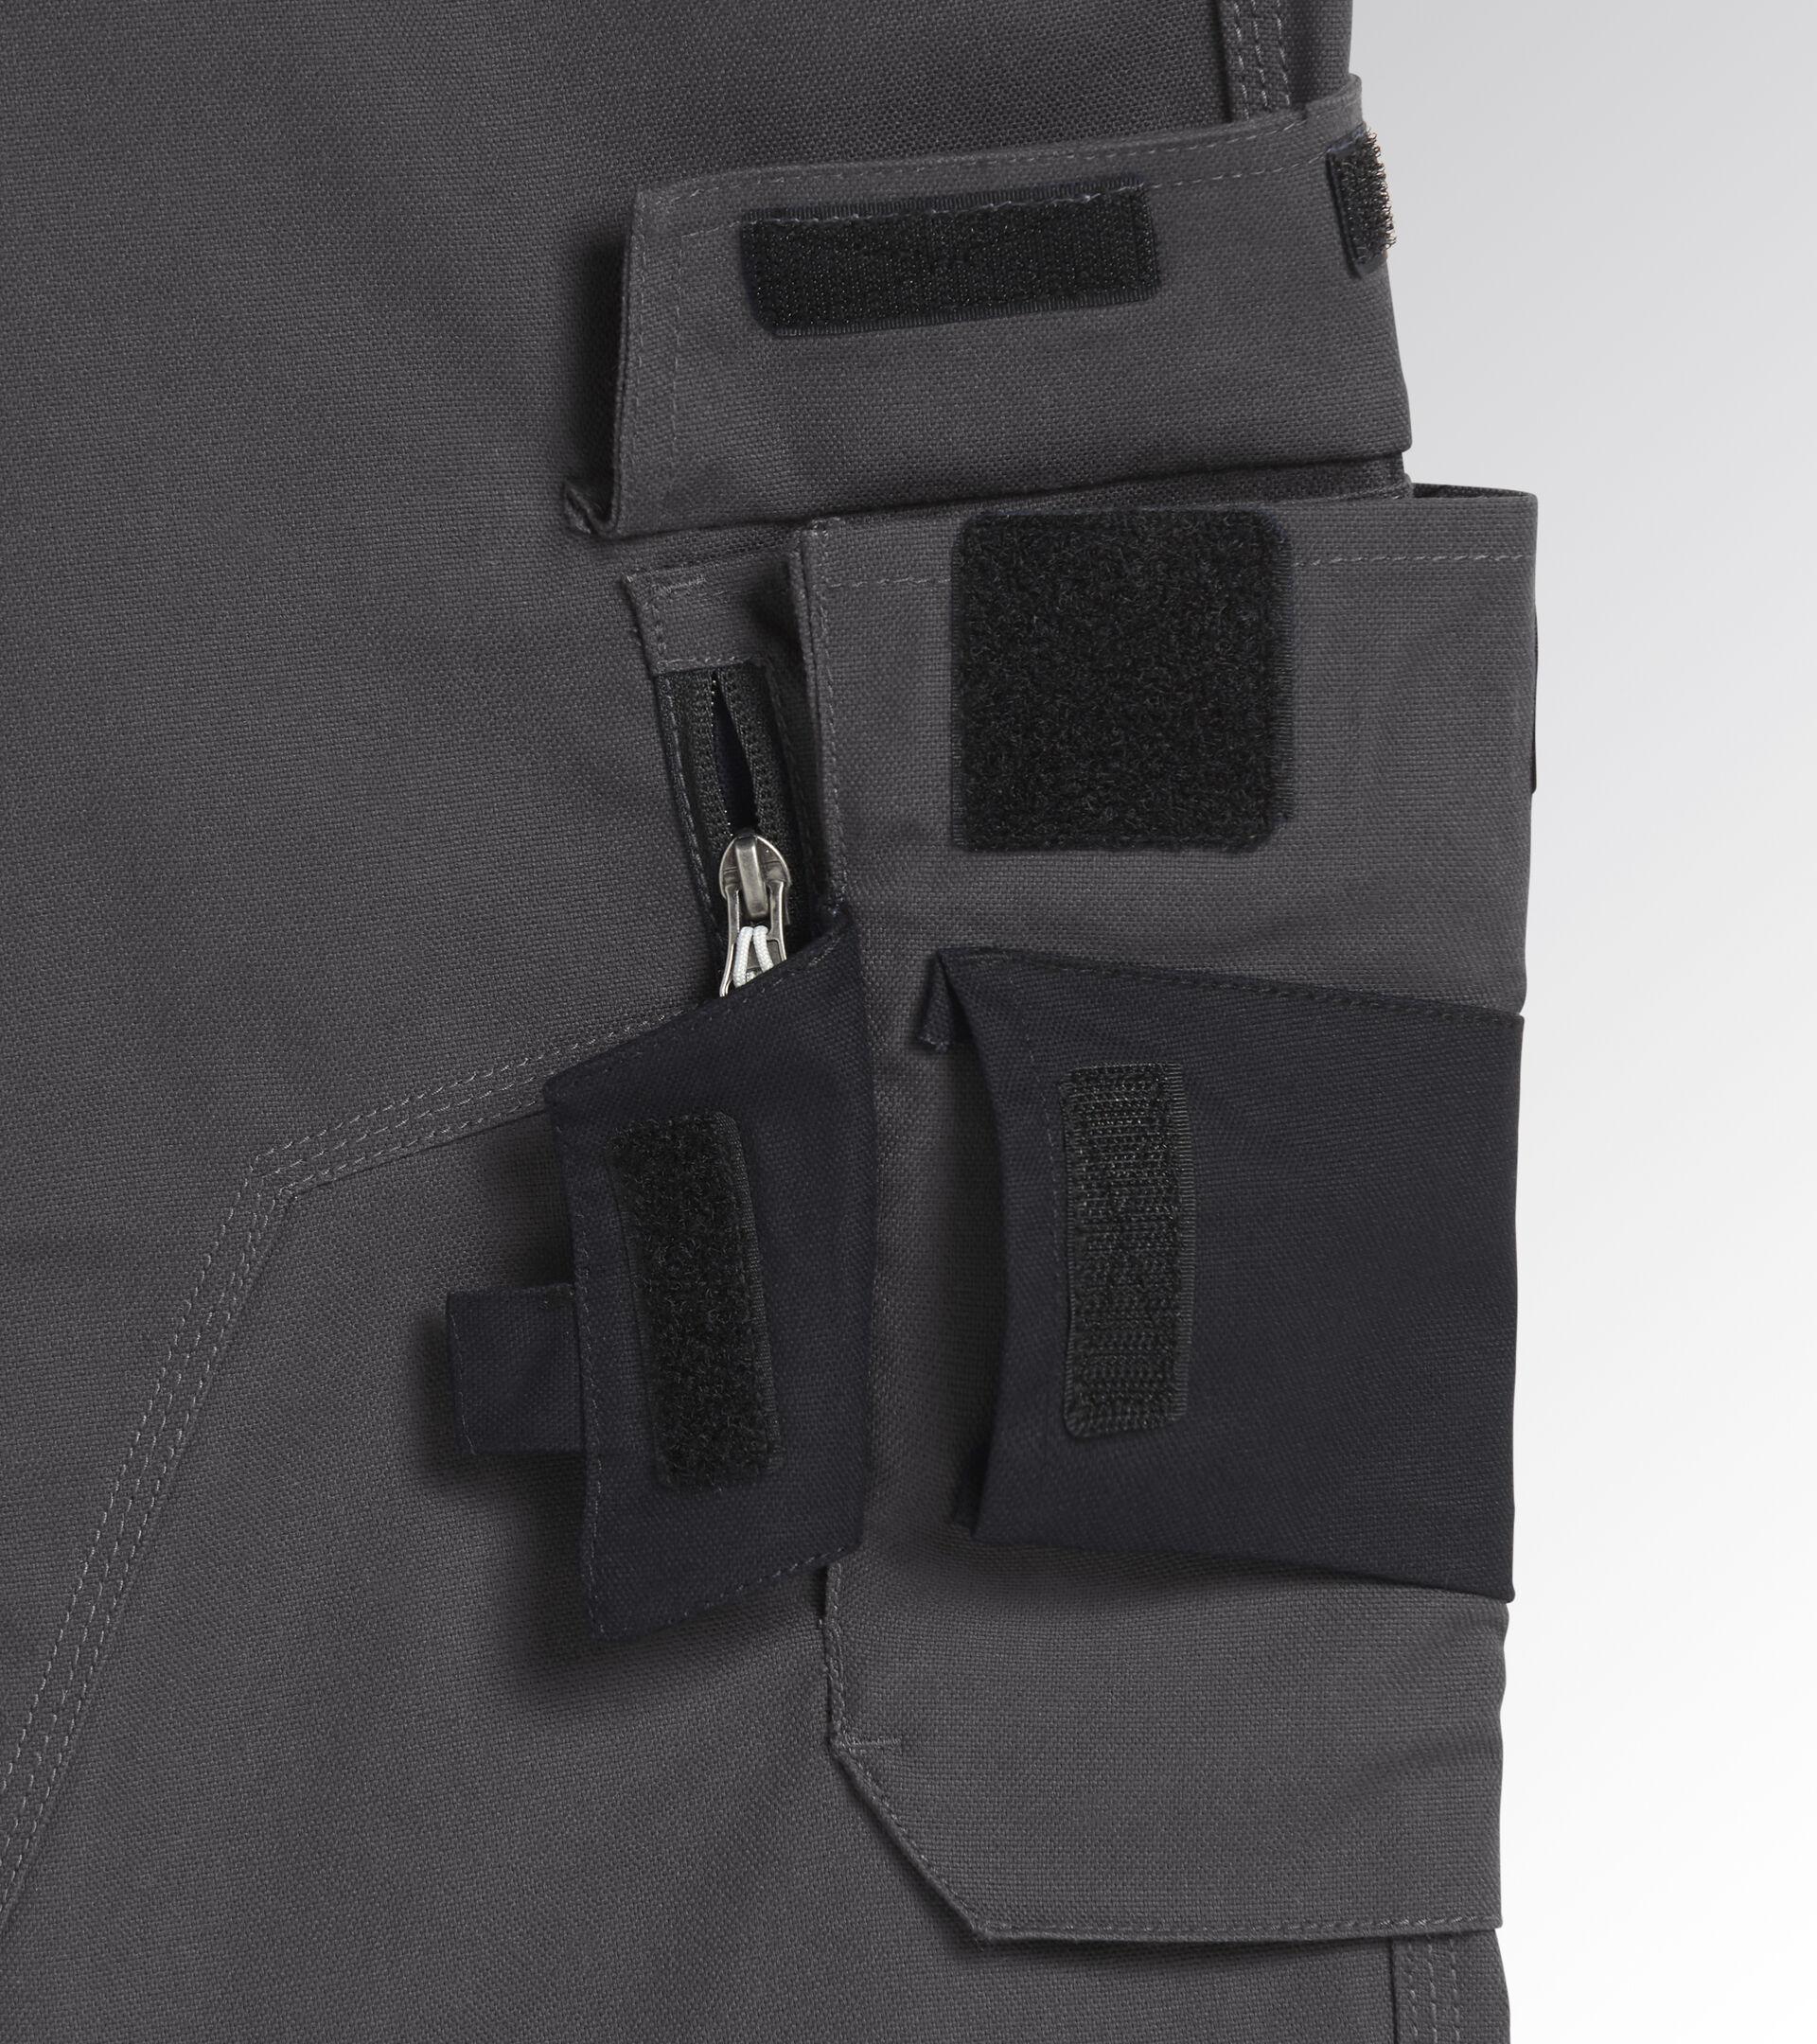 Apparel Utility UOMO PANT TOP PERFORMANCE BLACK COAL Utility